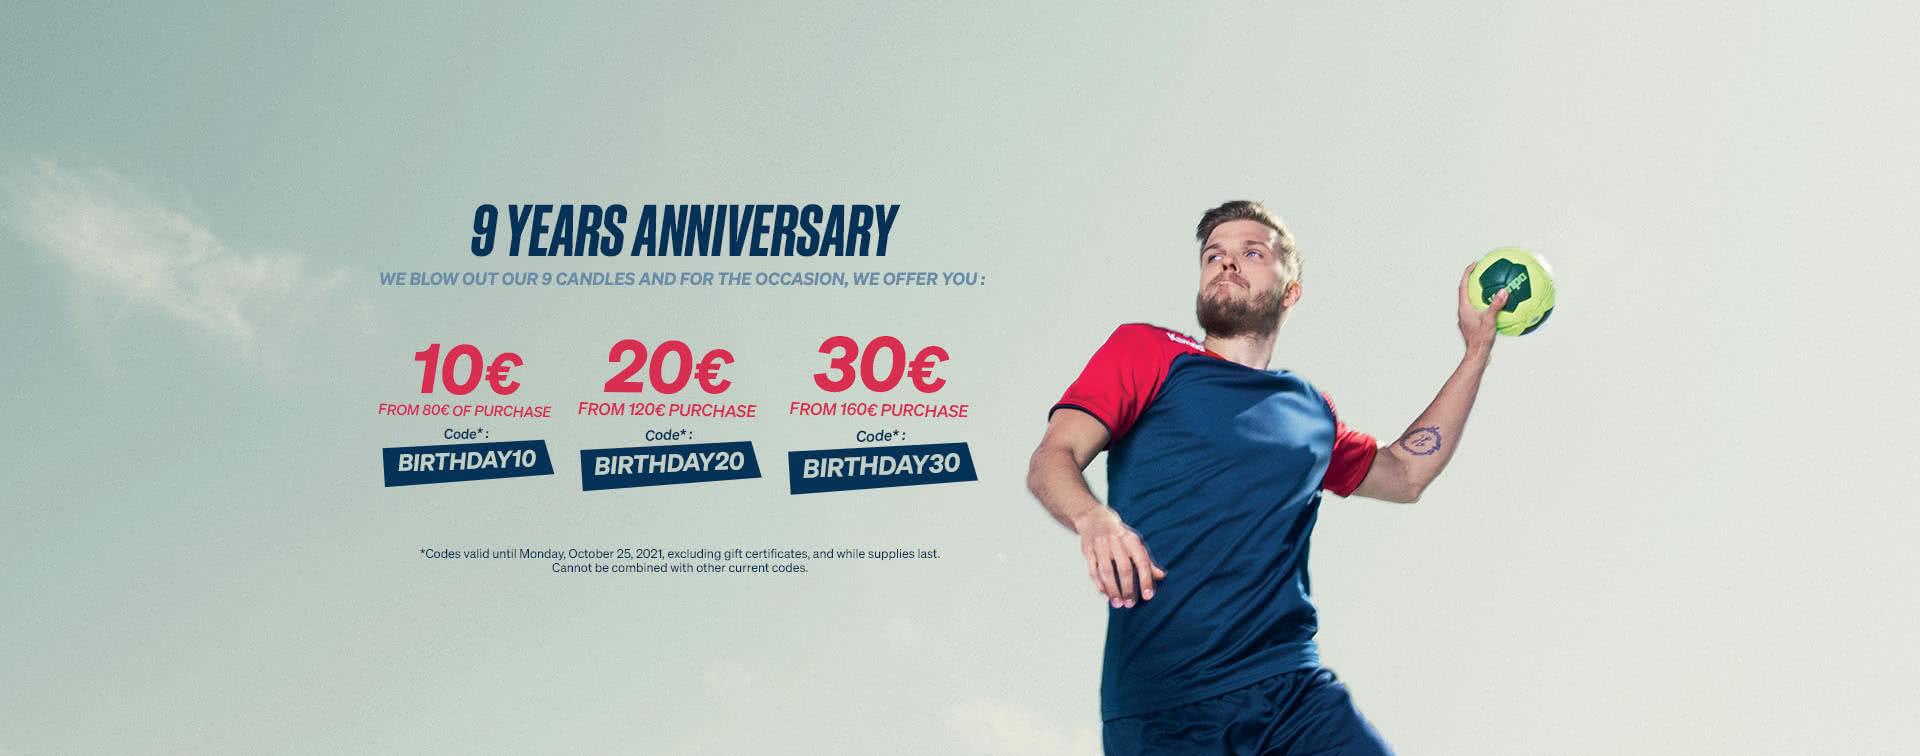 The best of the handball brand